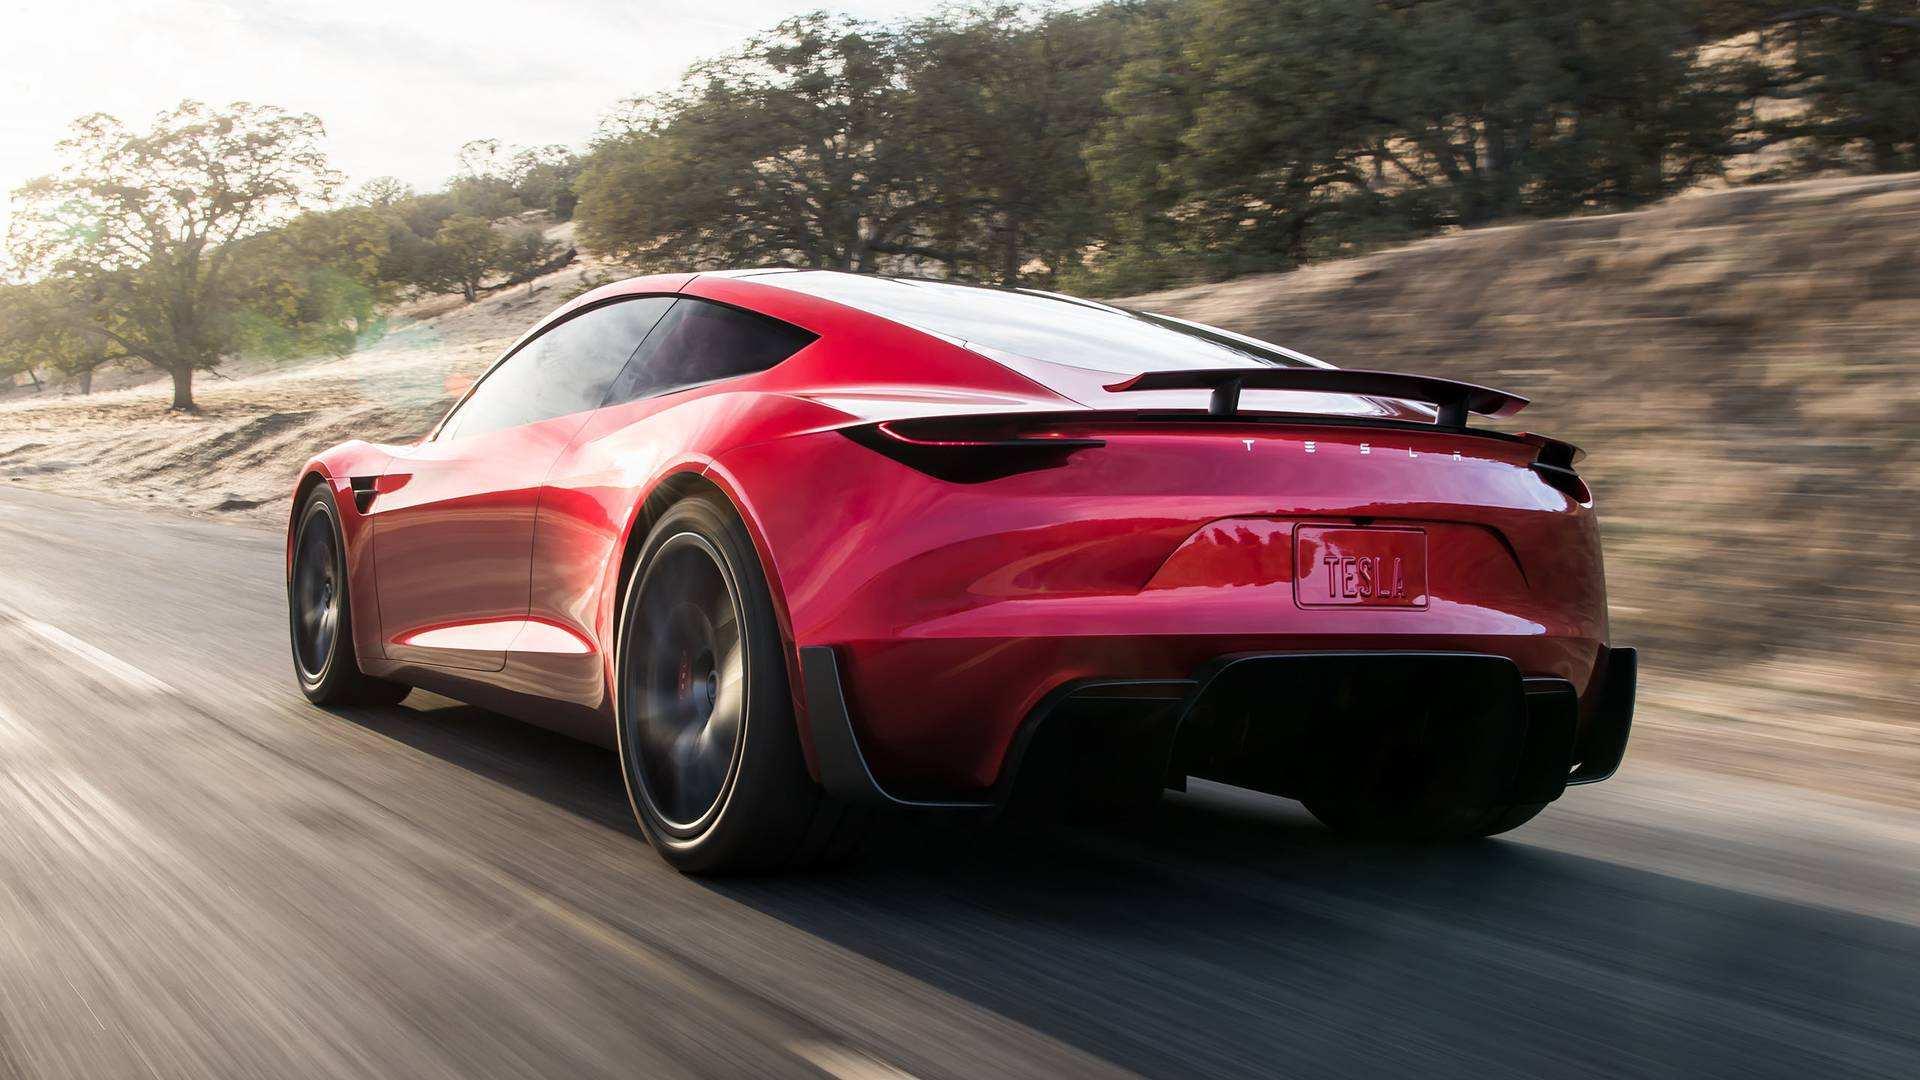 45 All New Tesla Goal 2020 Pricing with Tesla Goal 2020